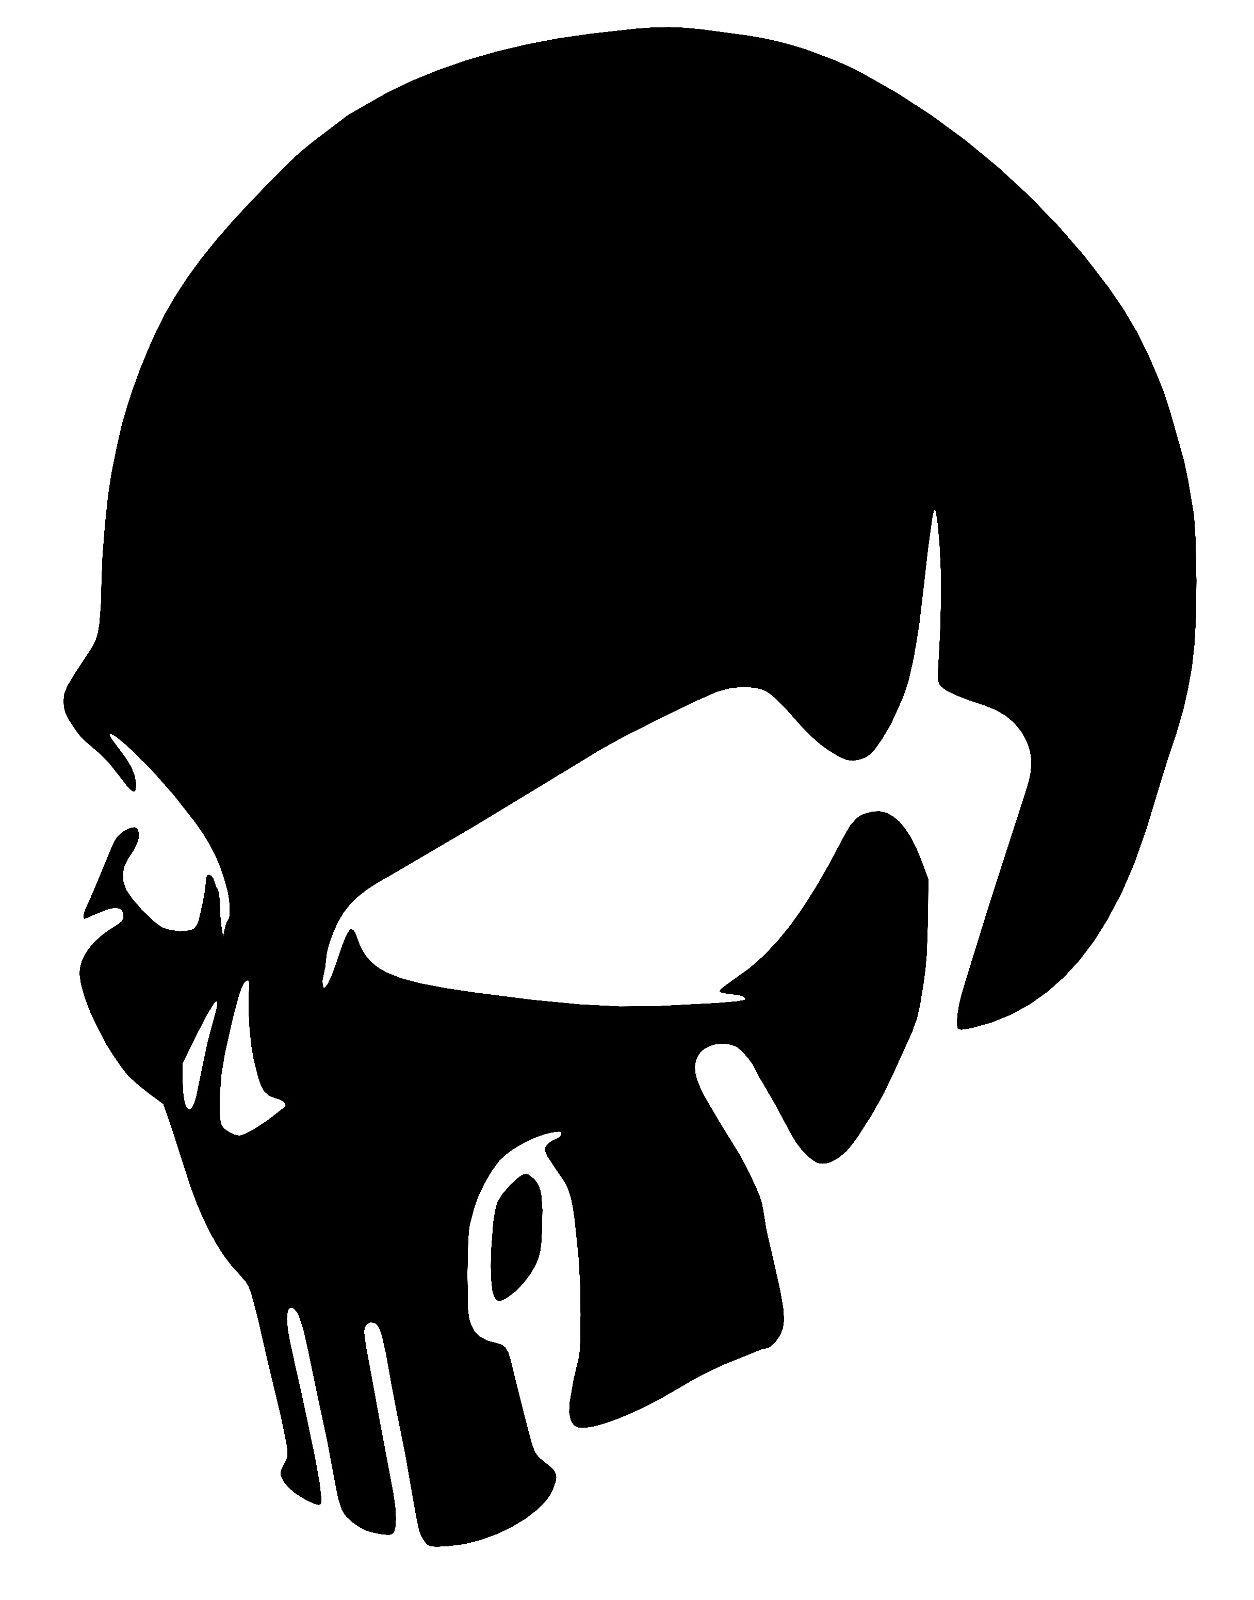 Bike stickers design joker - Details About Skull Punisher Vinyl Decal Sticker Window Wall Car Bumper Laptop Iphone Oracal